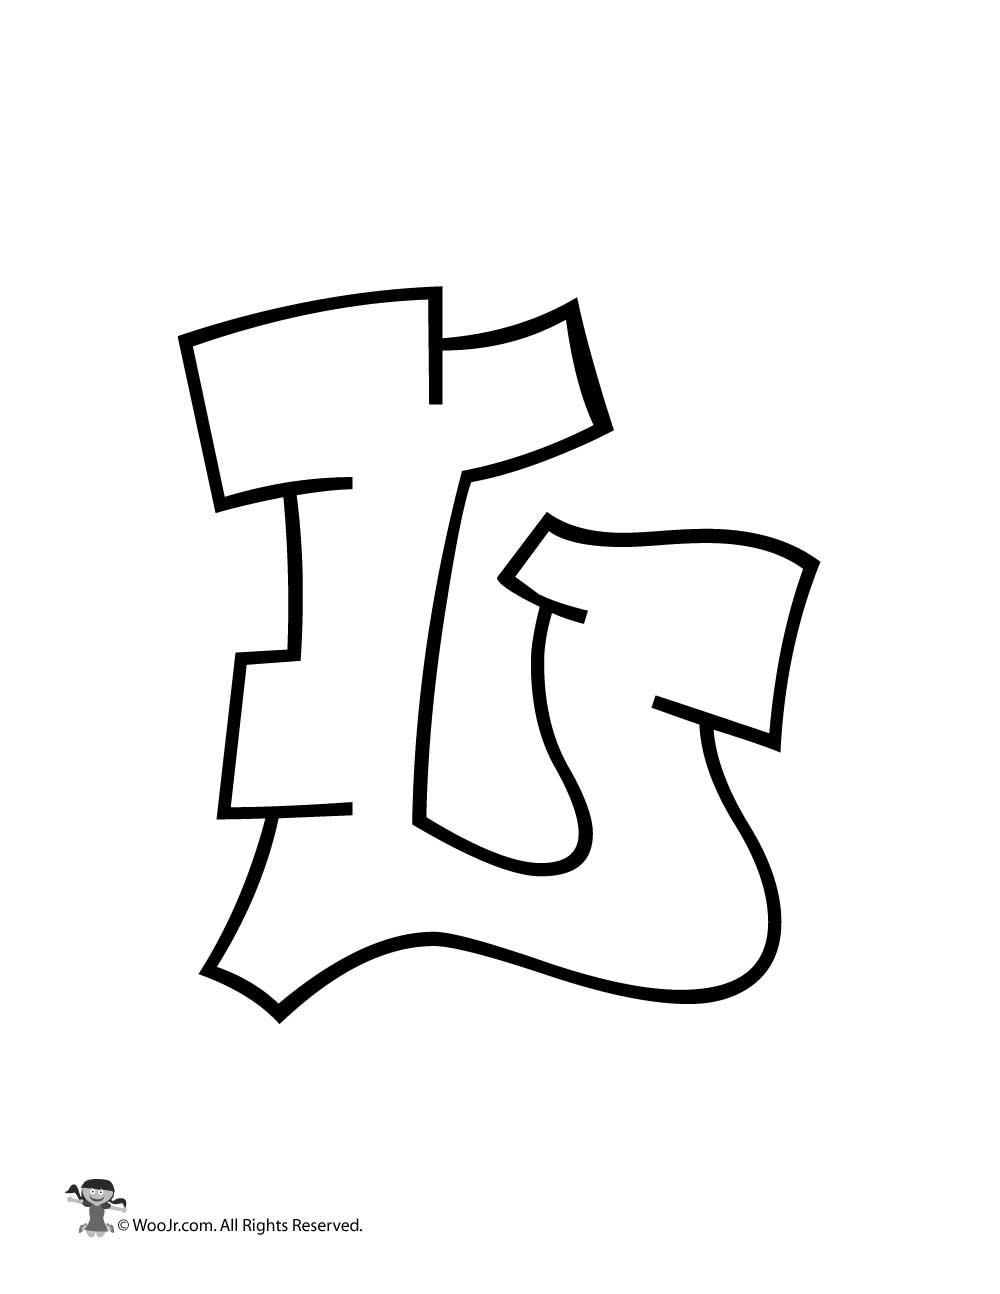 Graffiti Capital Letter L Woo Jr Kids Activities